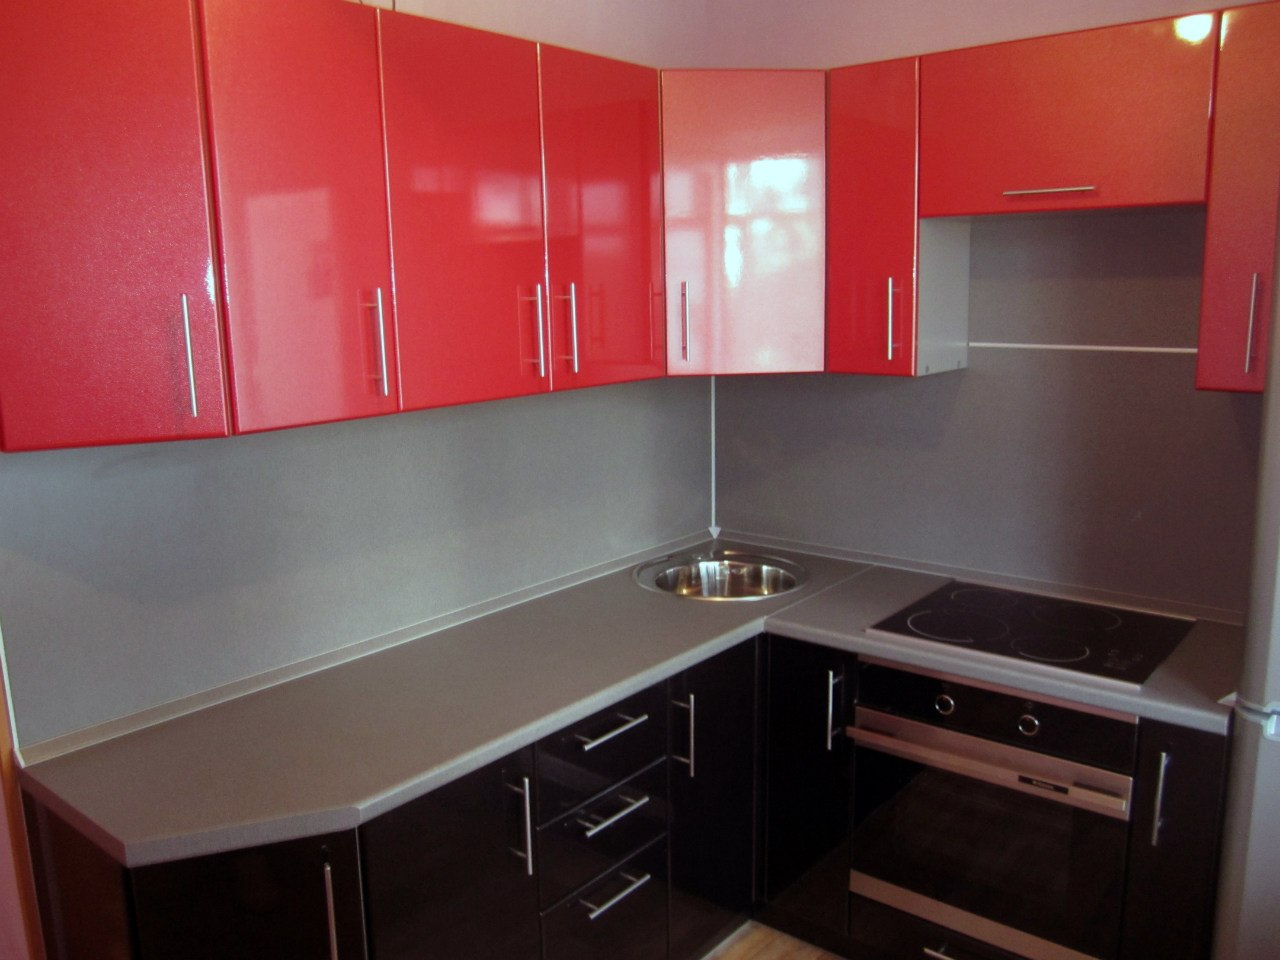 Черно-красная кухня МДФ